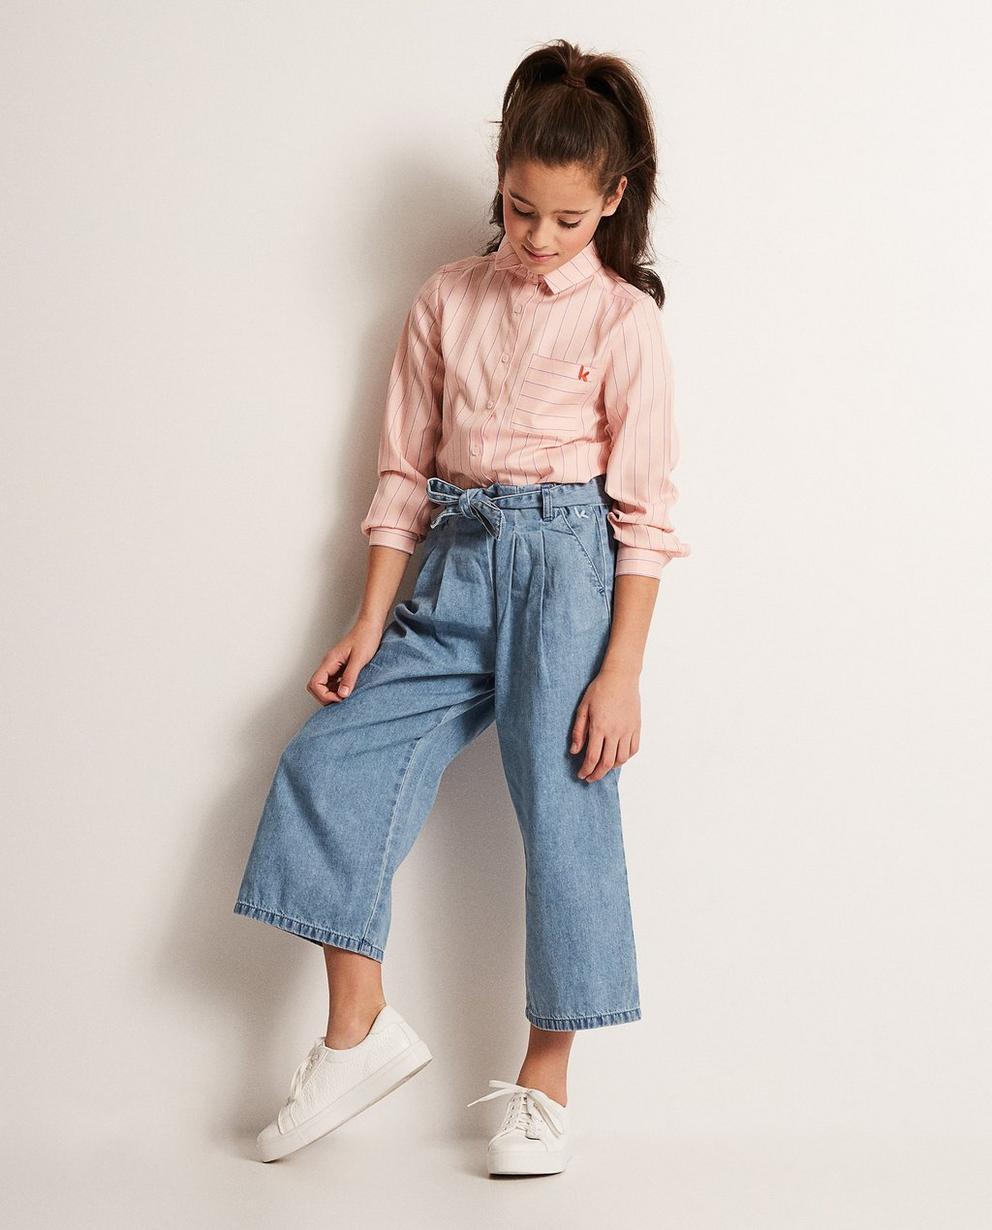 Jupe-culotte en jeans - Ketnet - Ketnet